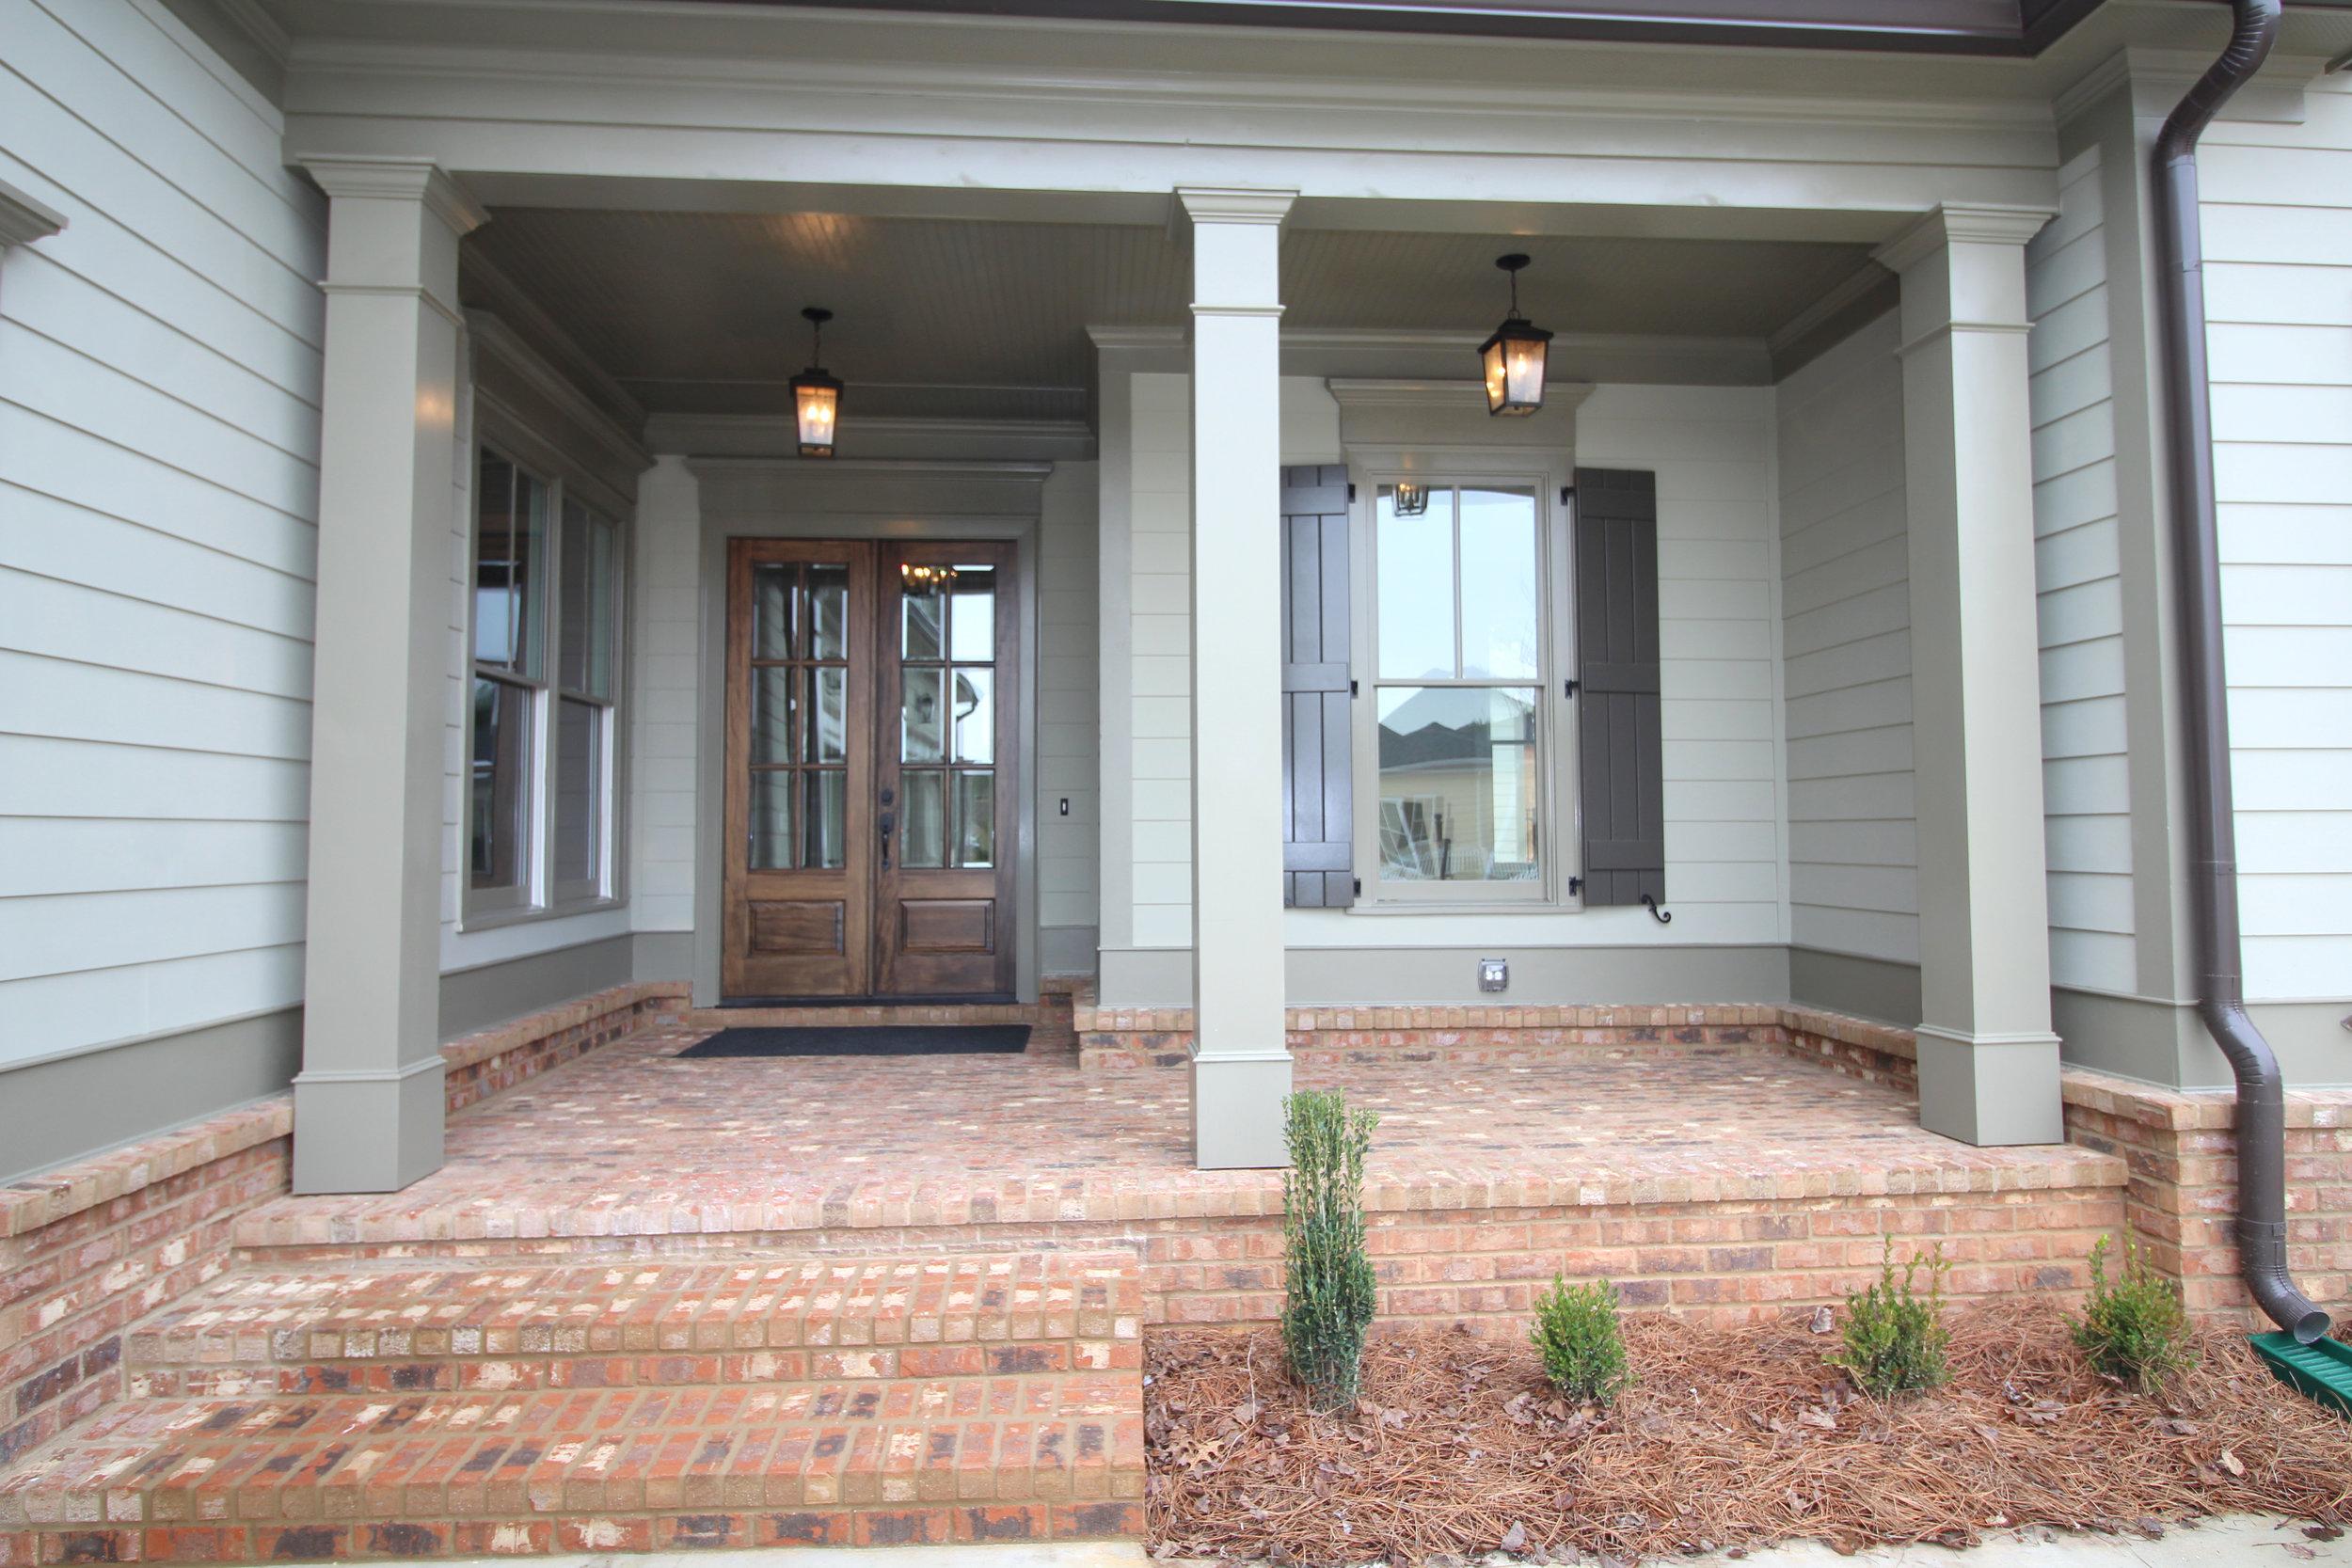 craftsman-style-homes-1756-greenleffe-drive-statham-ga-30666-the-georgia-club-oconee-county-oconee-springs-athens-area-home-for-sale-courtyard-homes.JPG